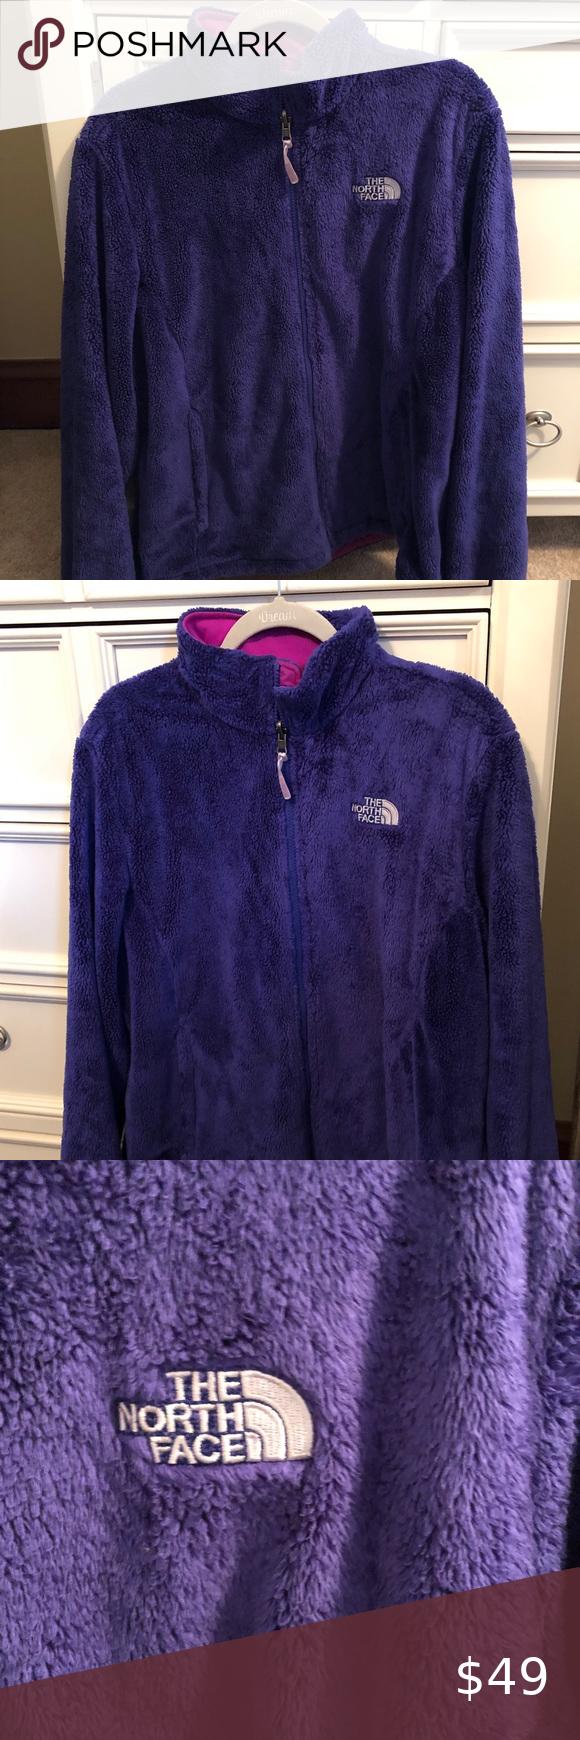 The North Face Osito Fleece Jacket Purple Xl In 2020 Girls North Face Jacket North Face Fleece Jacket Fleece Jacket [ 1740 x 580 Pixel ]